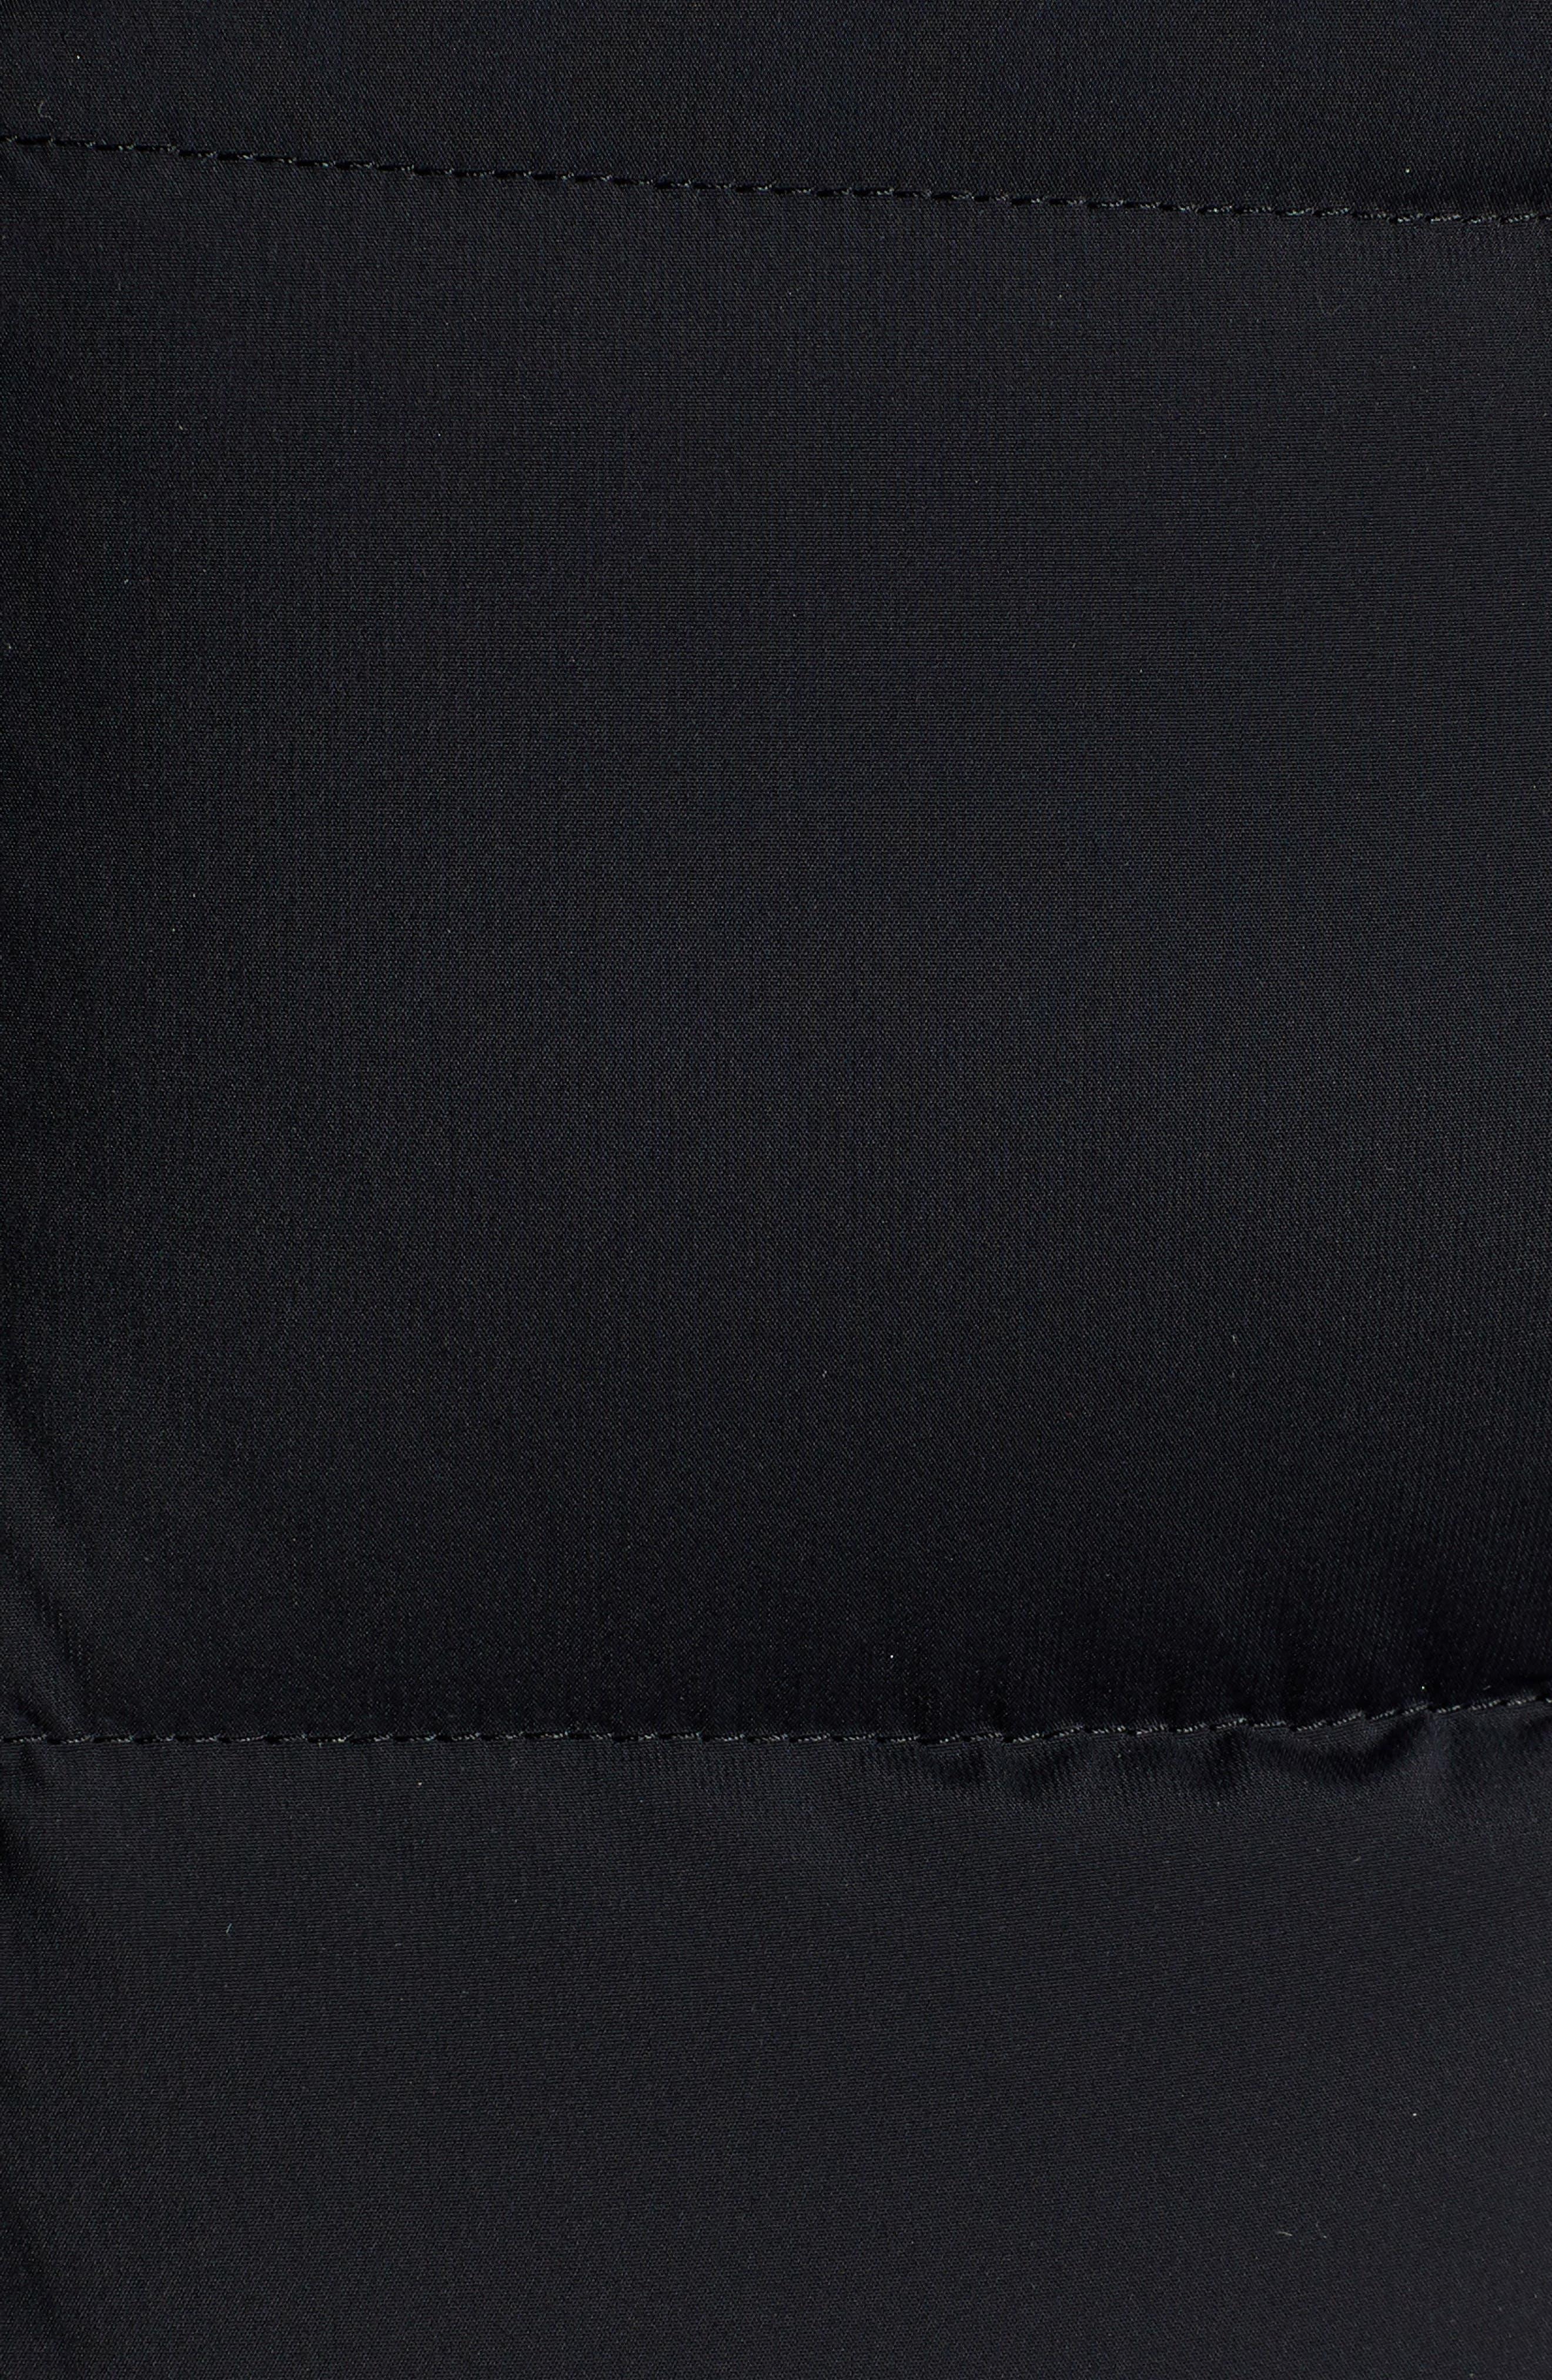 MACKAGE, Calla Genuine Fox Fur Trim Hooded Down Coat, Alternate thumbnail 7, color, BLACK